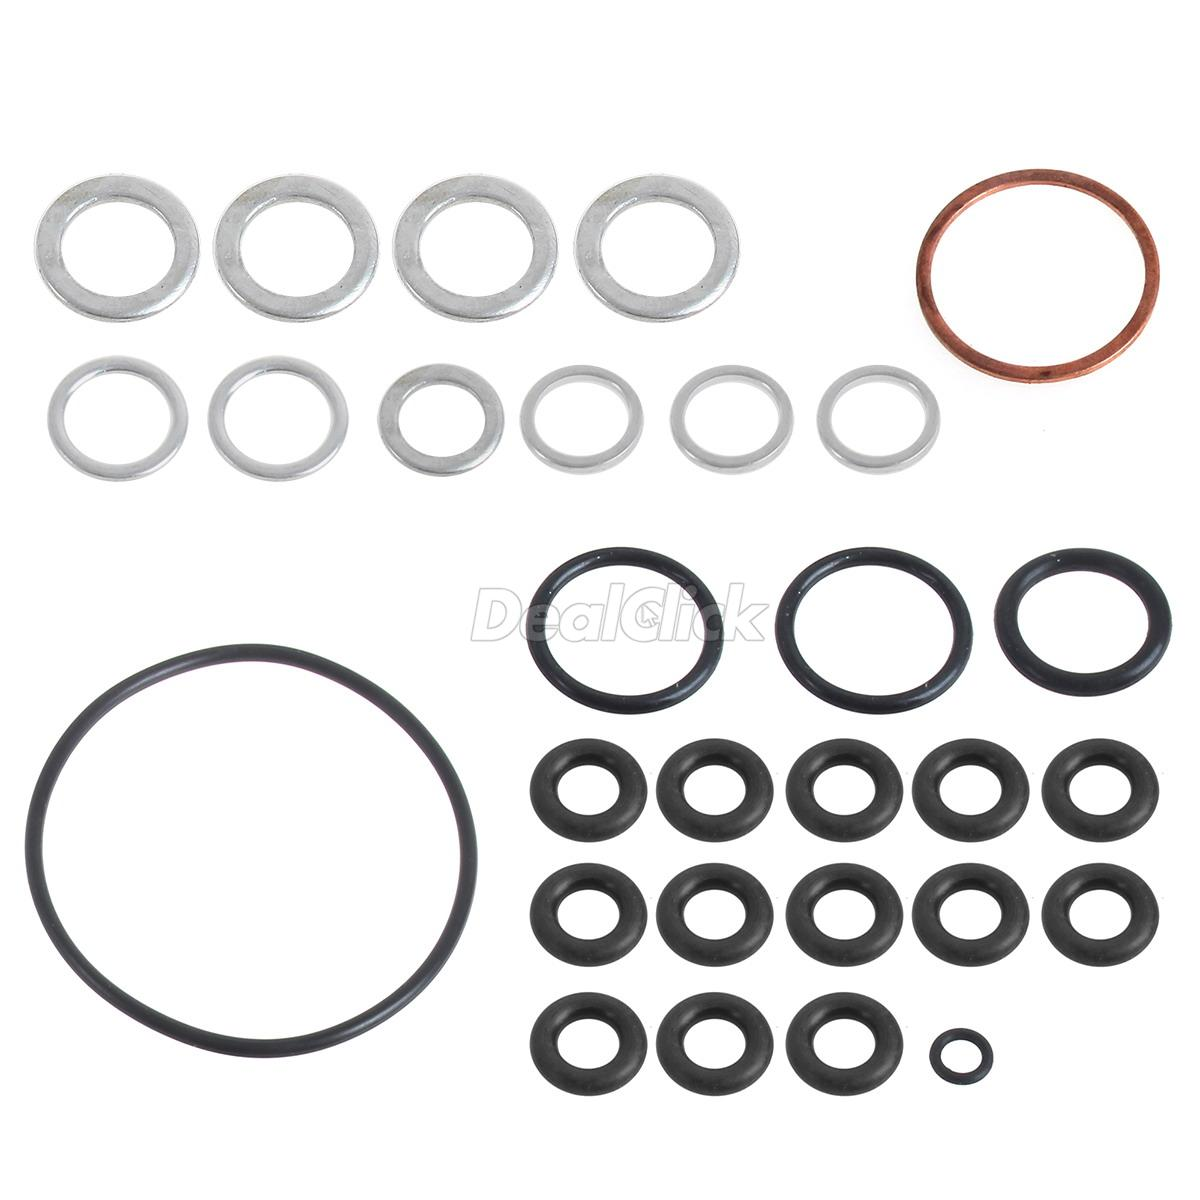 Bmw Z3 Coupe Production Numbers: For BMW E36 323i 328i 528i Z3 Engine HEAD GASKET Bolt Kit